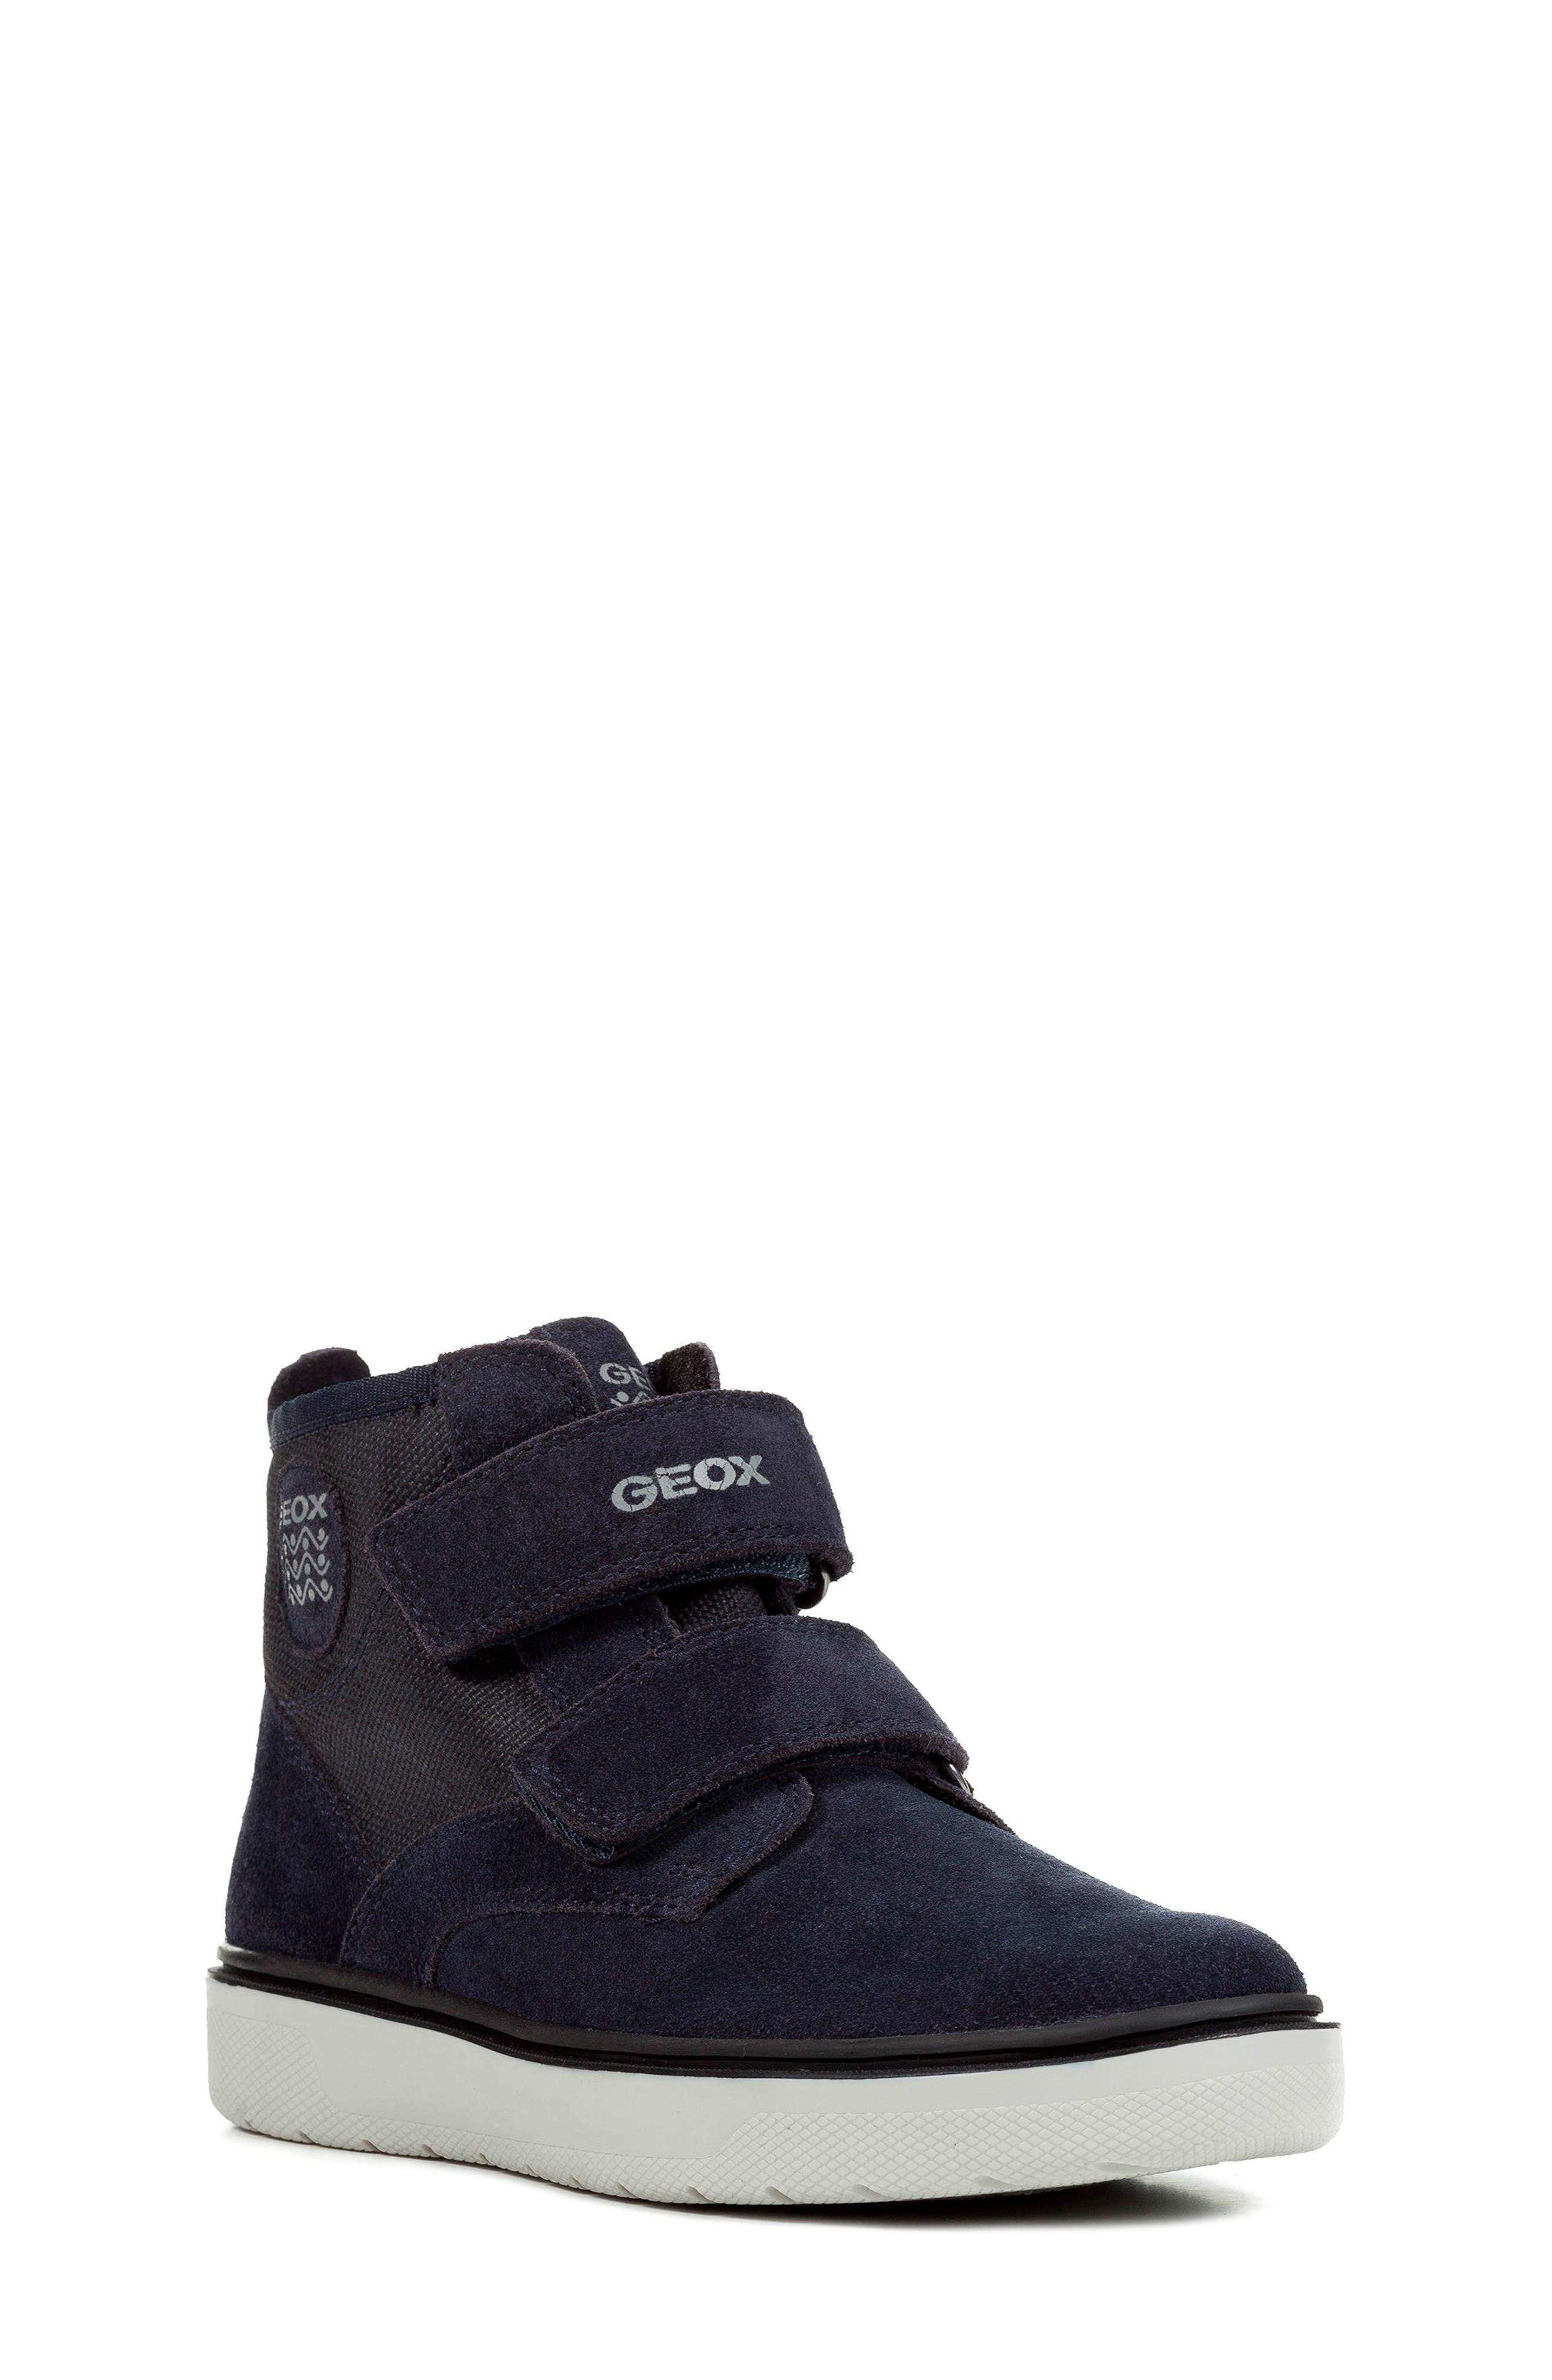 Riddock High Top Sneaker,                         Main,                         color, NAVY/GREY